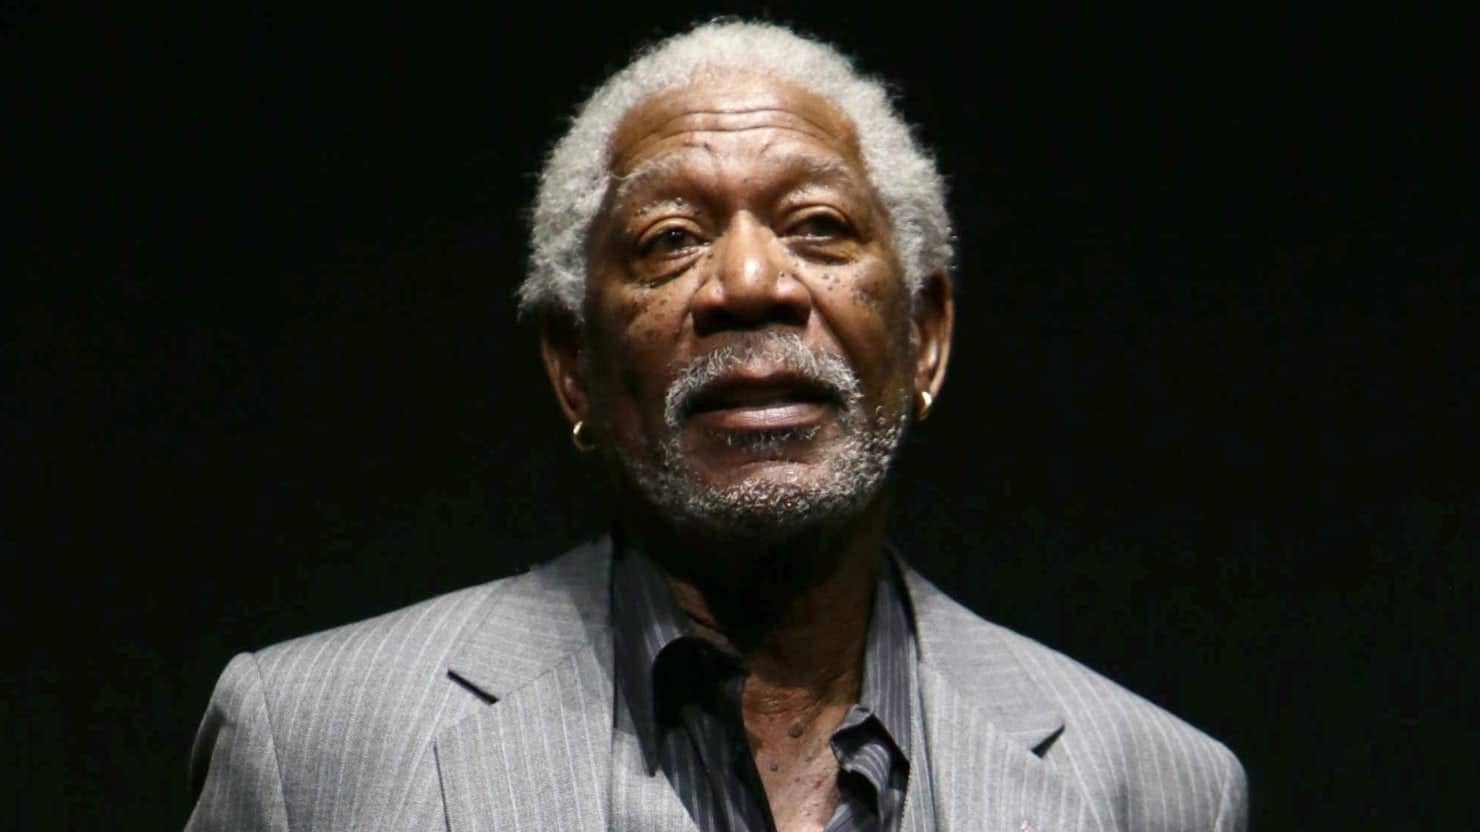 Morgan Freeman Height Net Worth Age Bio Family Wife